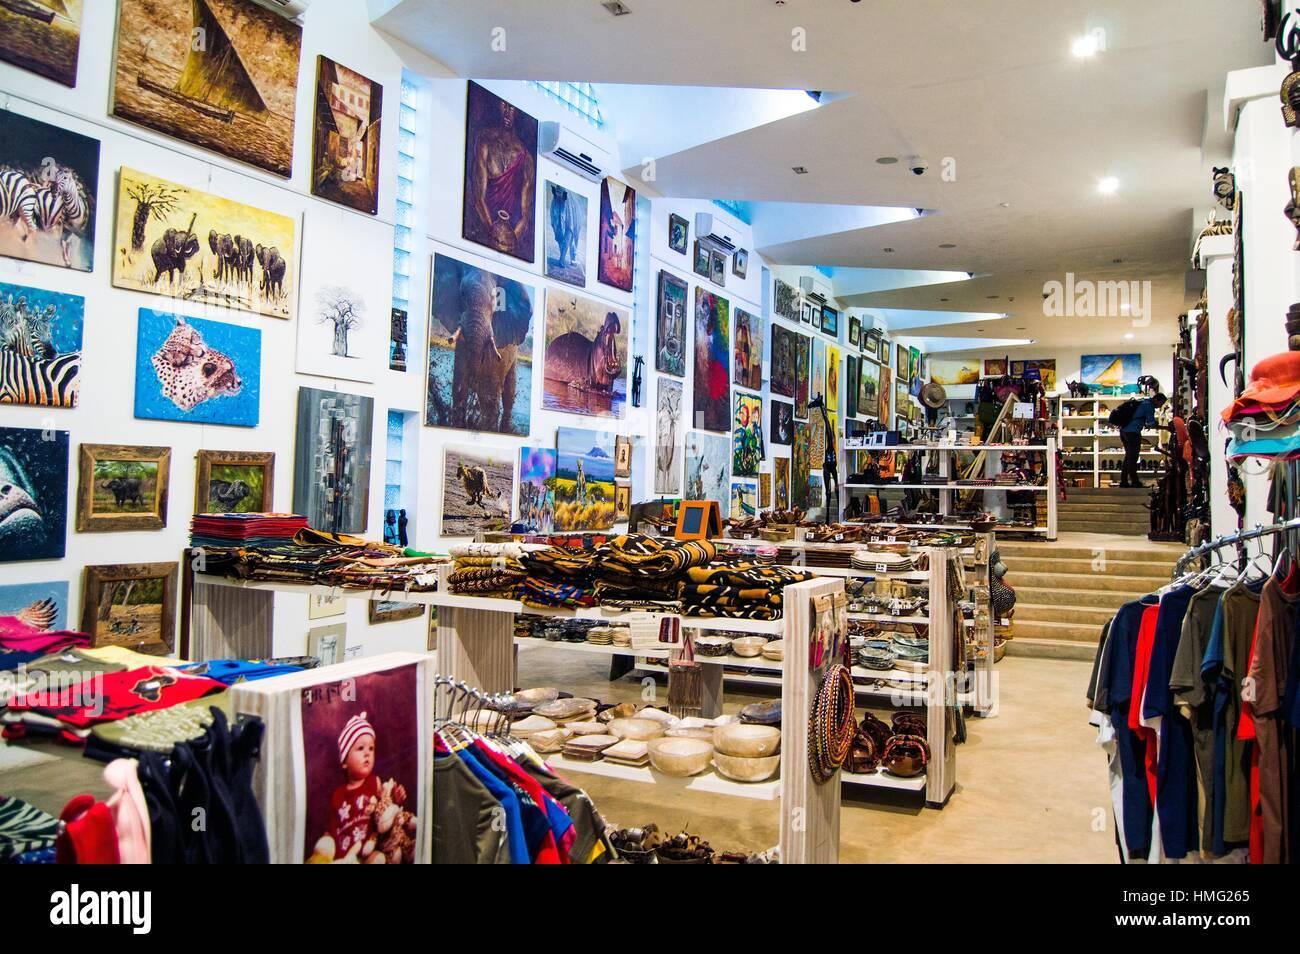 Art And Craft Shop Interior Hotel Slipway Dar Es Salaam Tanzania